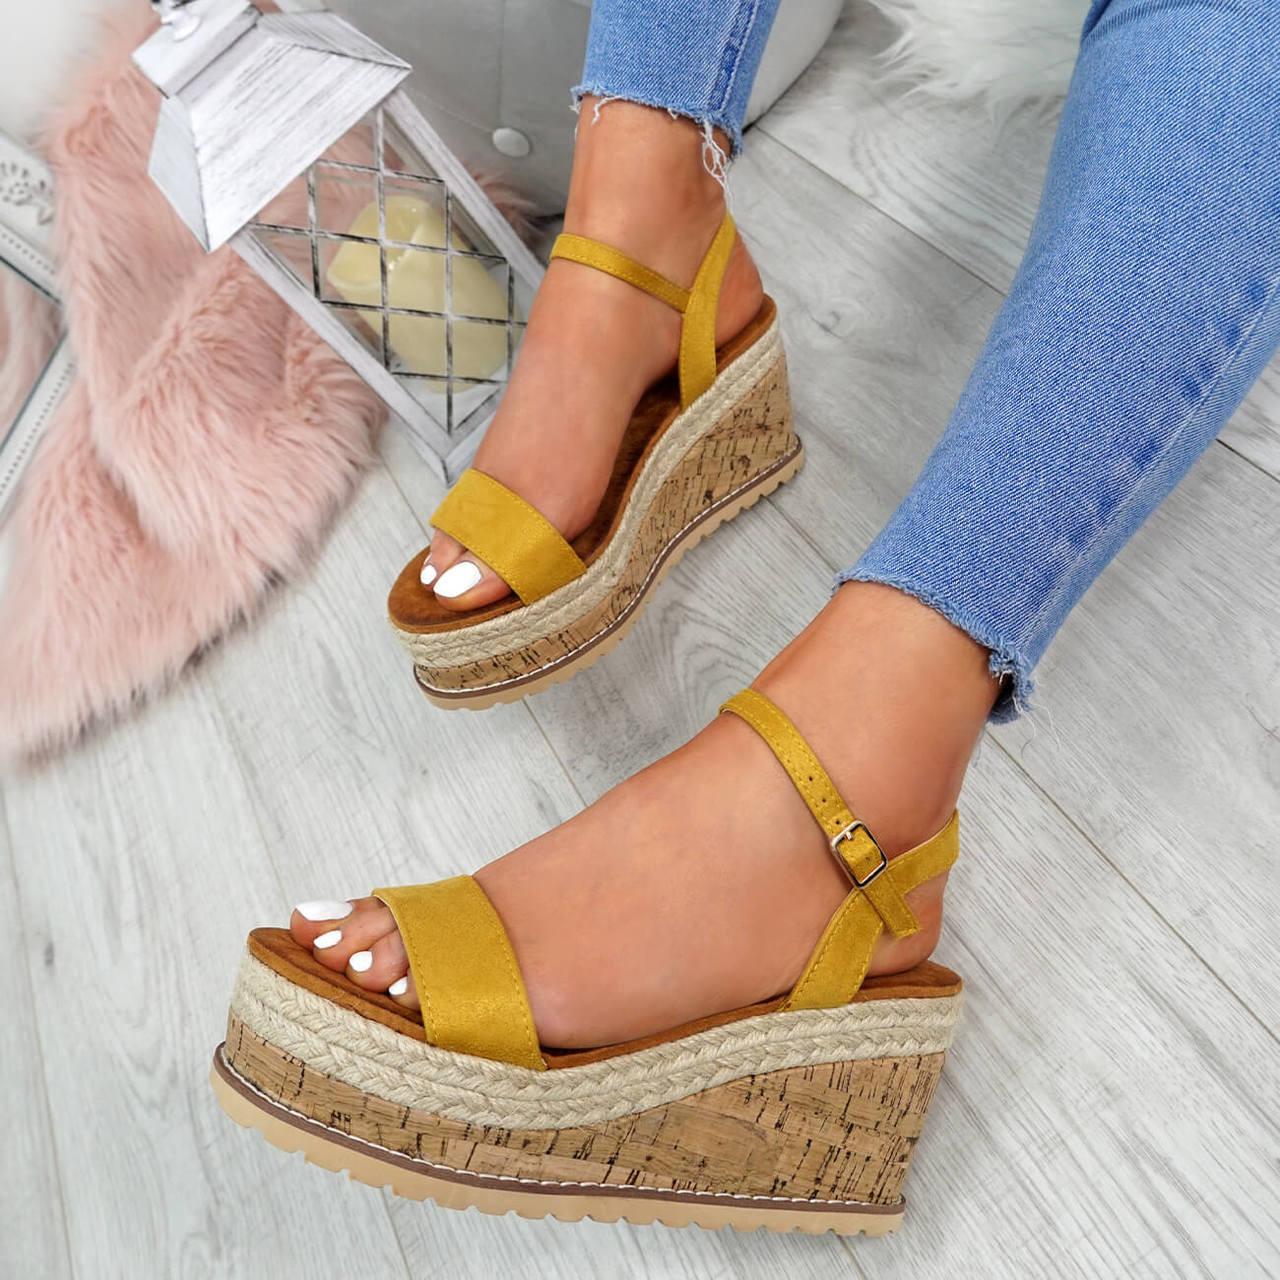 c8e1392b5fc4 Womens Ladies High Heel Platform Sandals Wedge Buckle Peep Toe Shoes Size